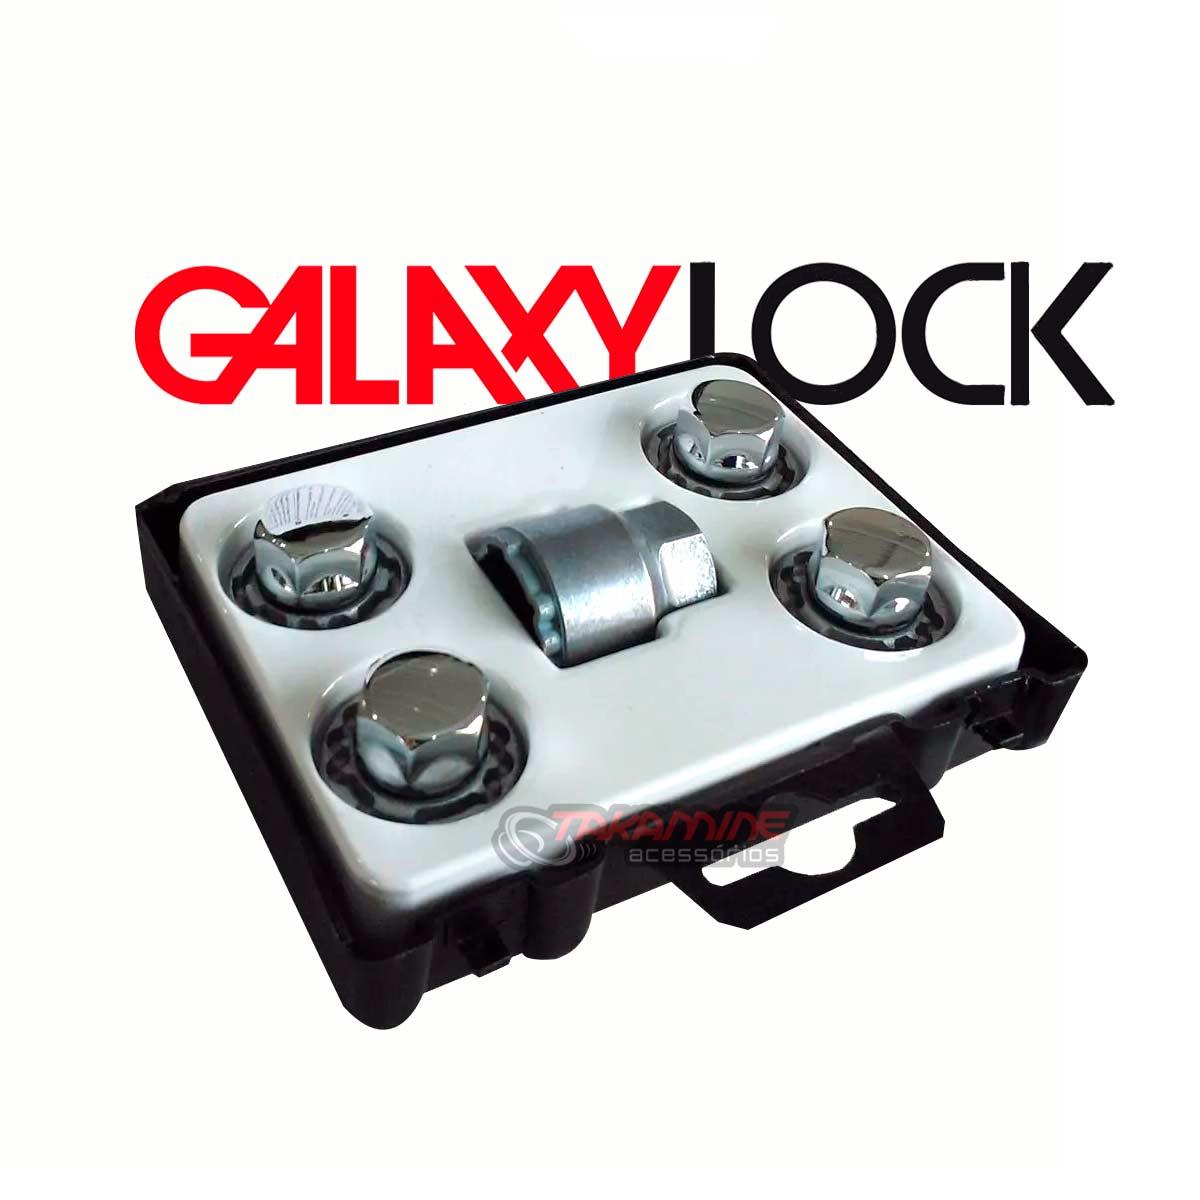 Parafuso antifurto para rodas Galaxy Lock Fox 2003 até 2020 ZA/M